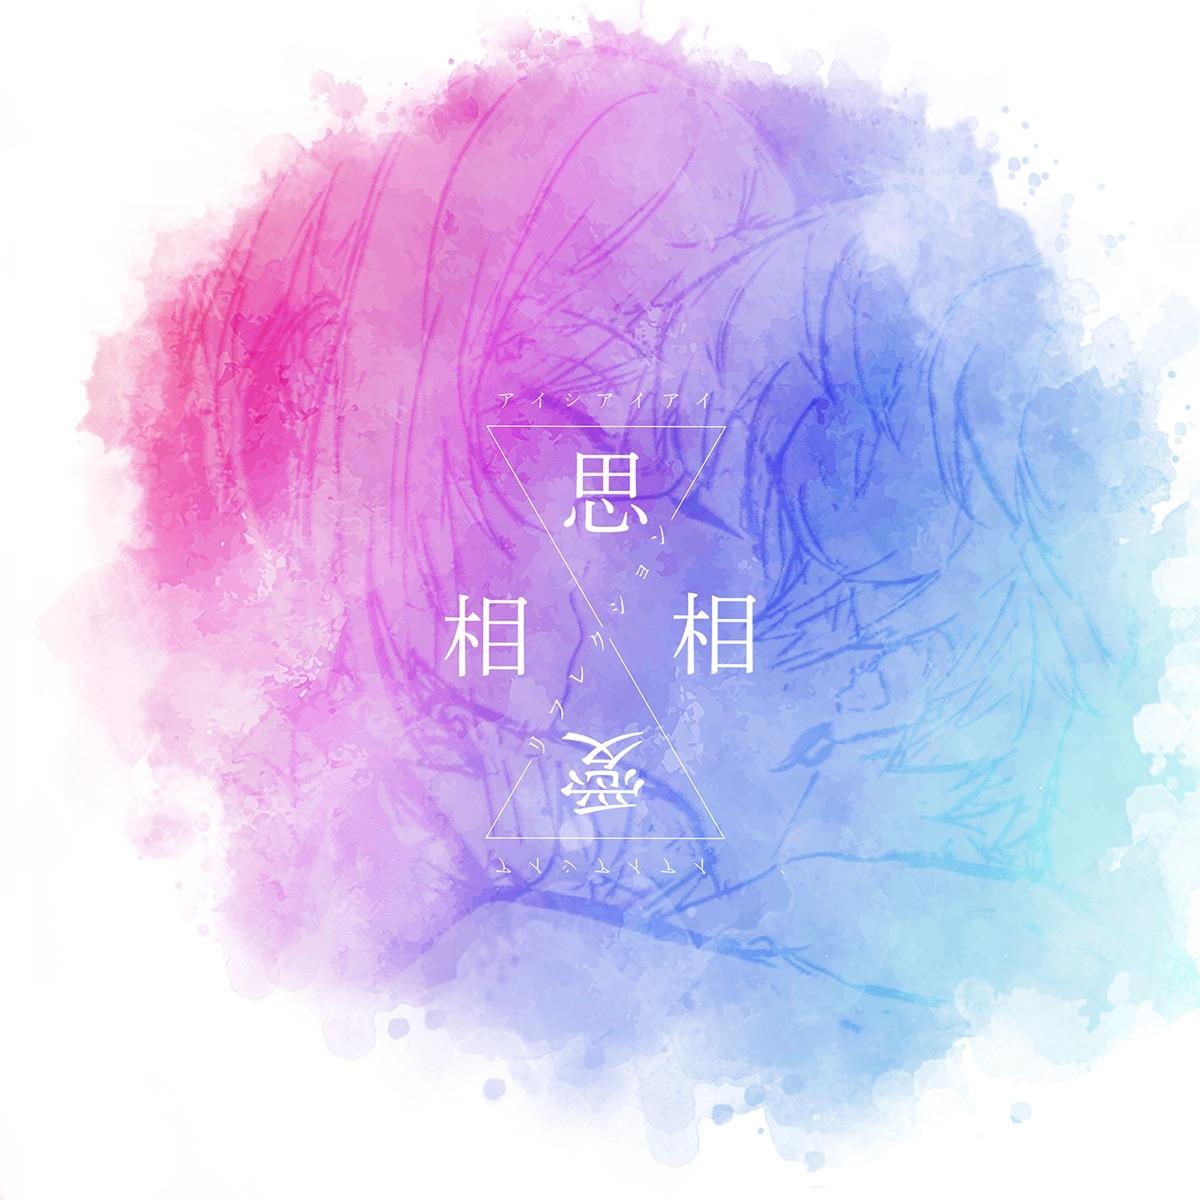 『HIMEHINA - 相思相愛リフレクション』収録の『相思相愛リフレクション』ジャケット